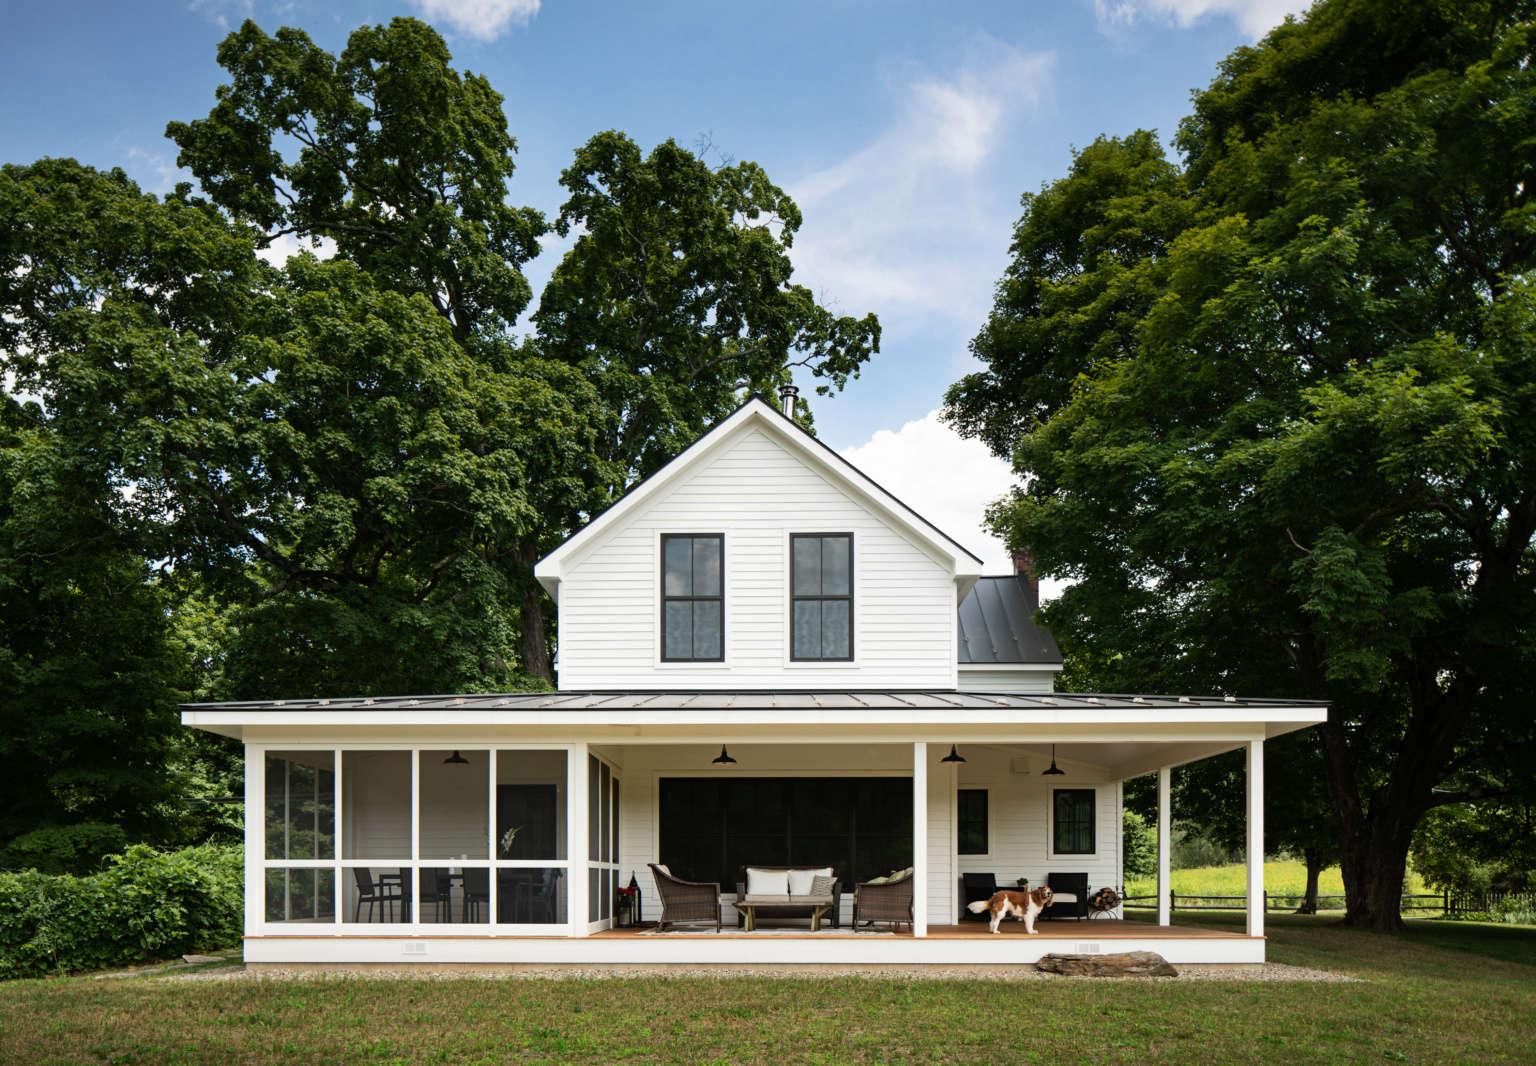 dutchess county ny farmhouse remodel by architect jill singer 1